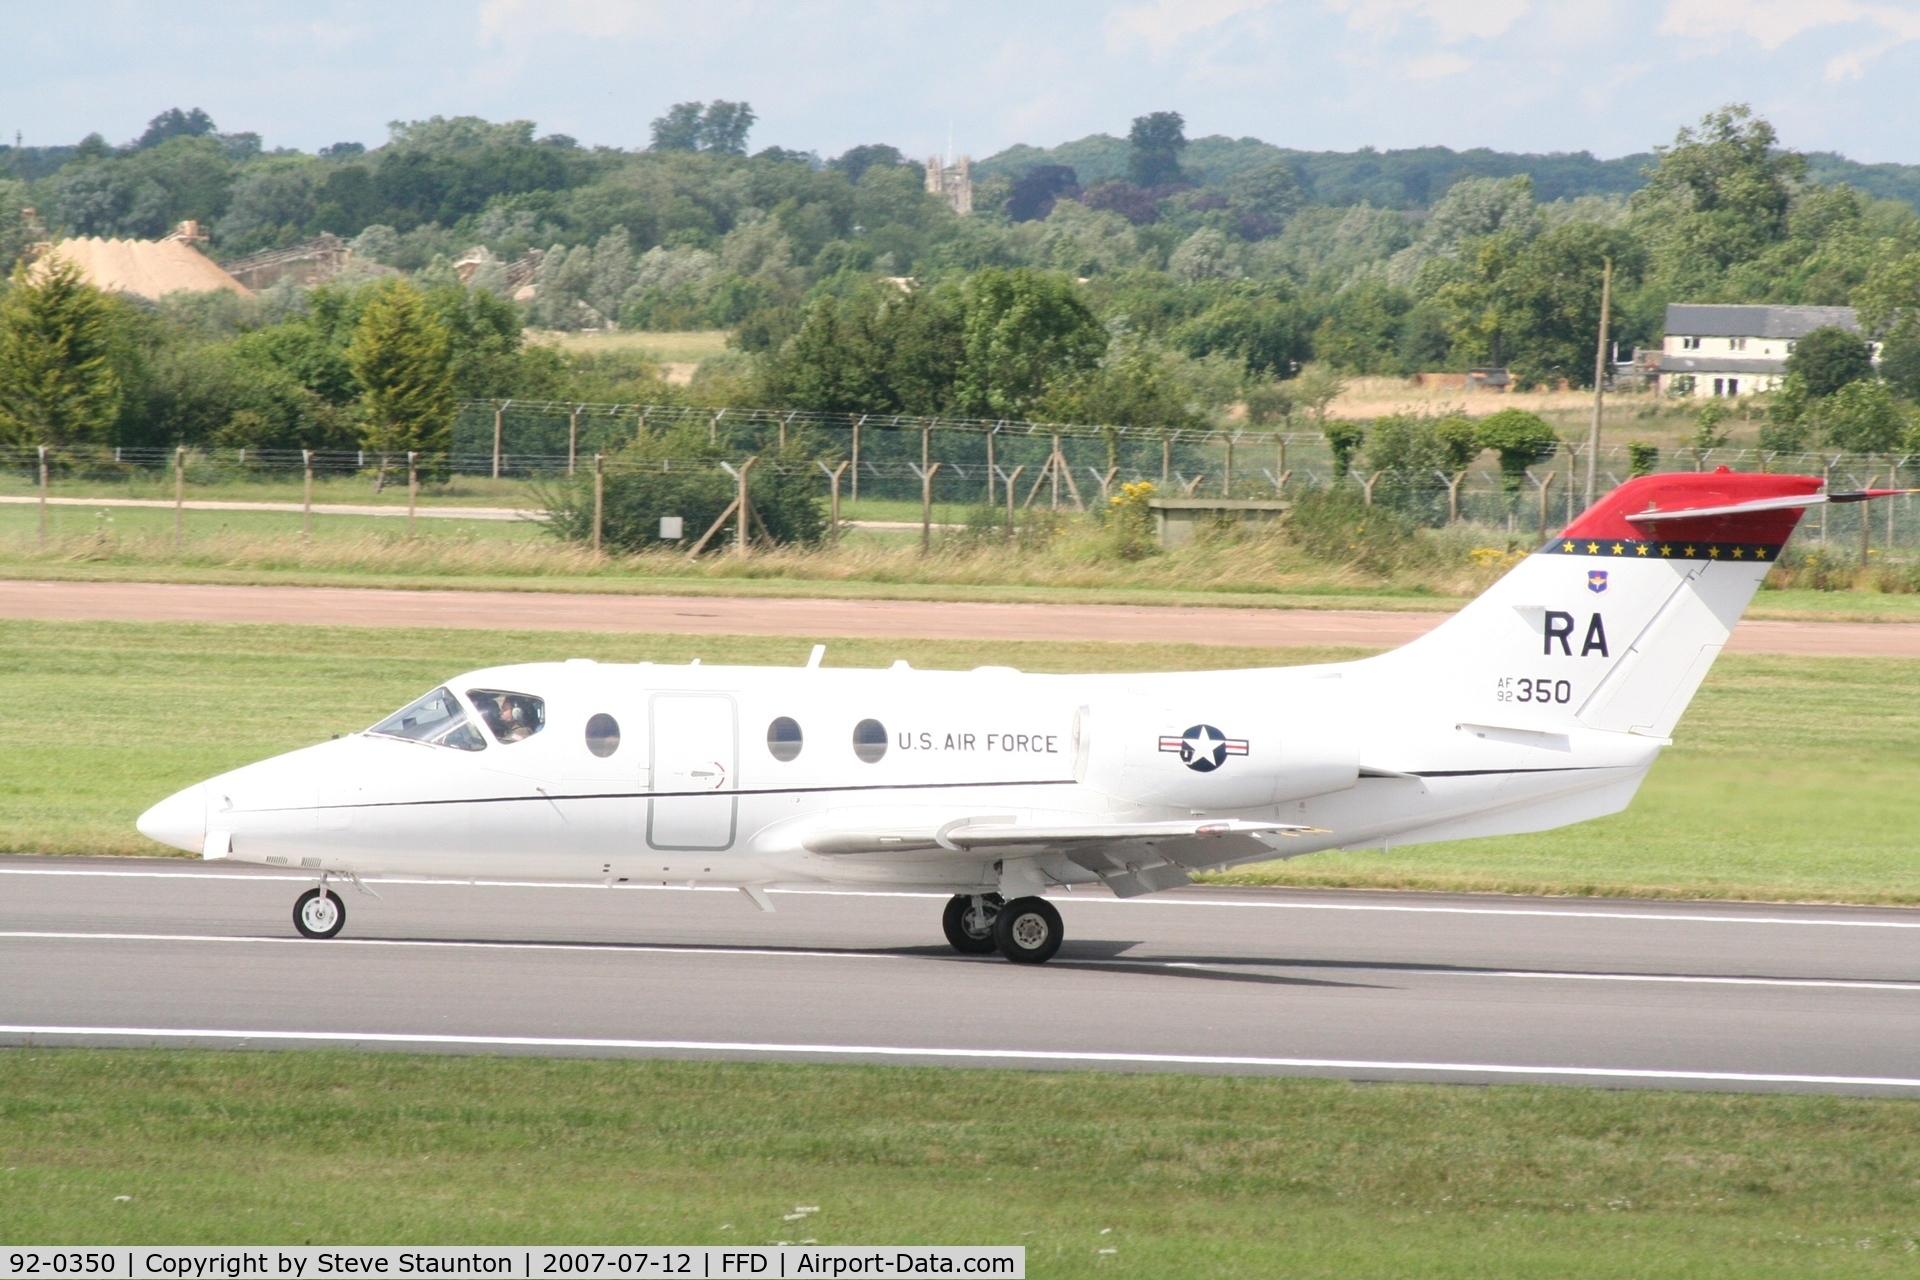 92-0350, 1992 Beechcraft T-1A Jayhawk C/N TT-64, Royal International Air Tattoo 2007